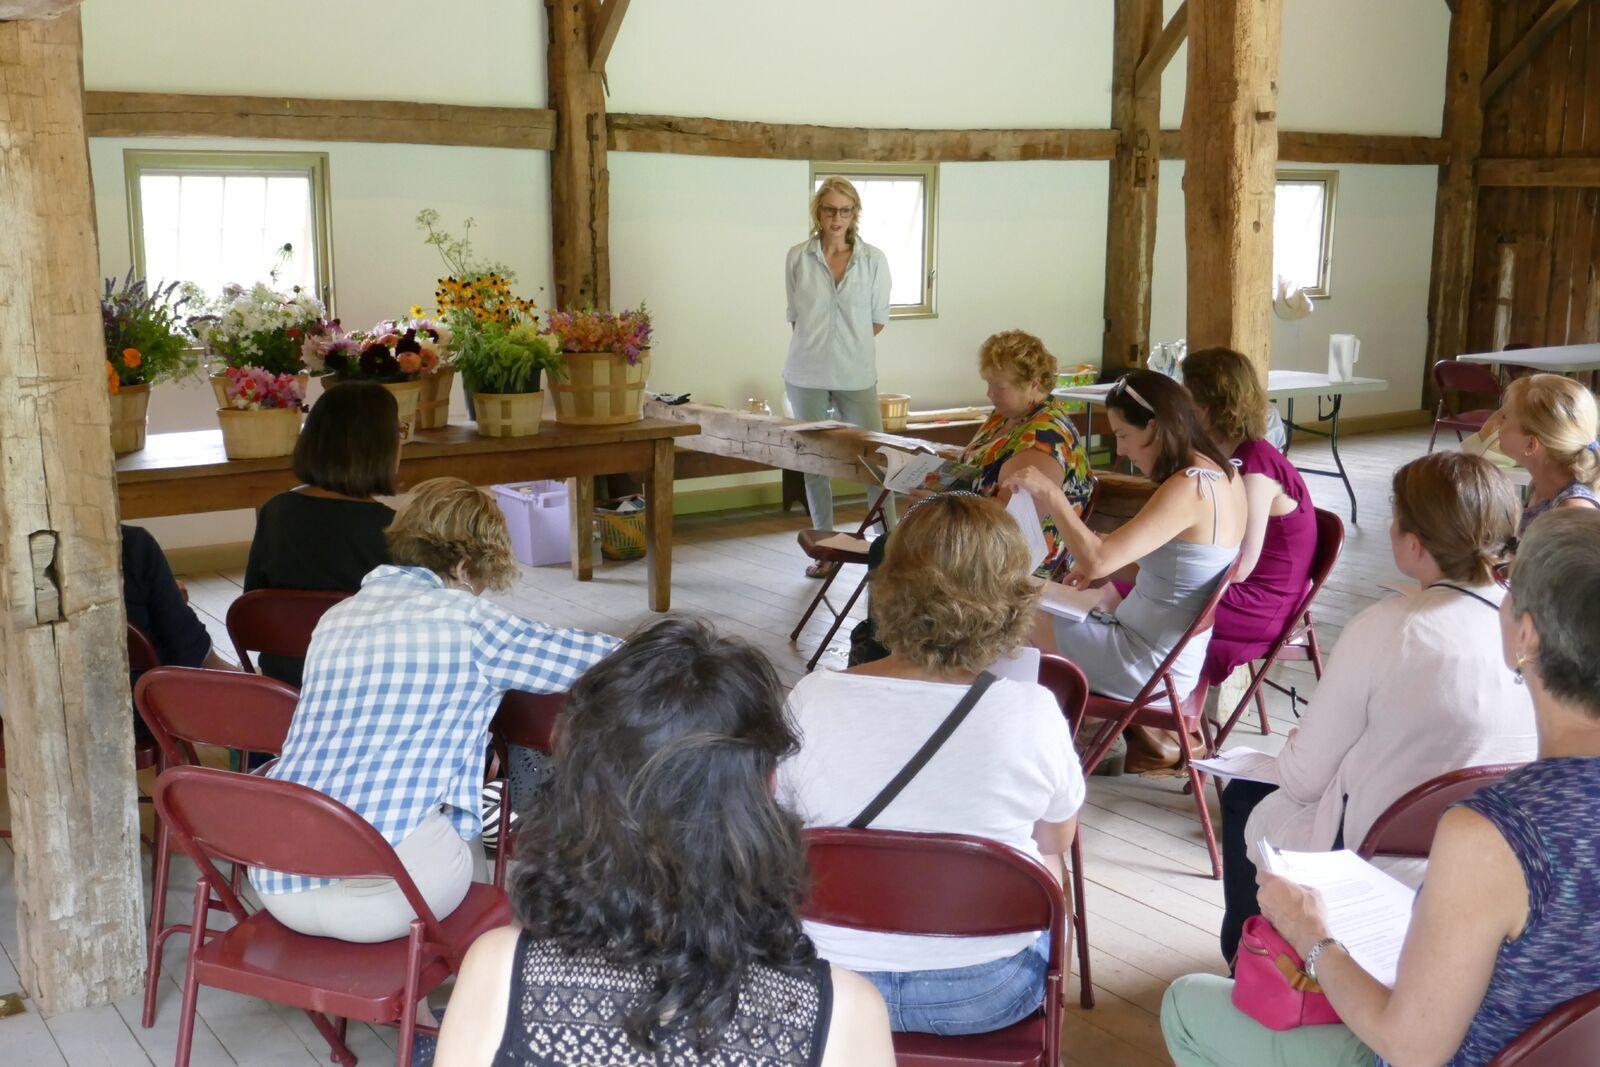 Hollister House Garden Announces New Barn Talks Series